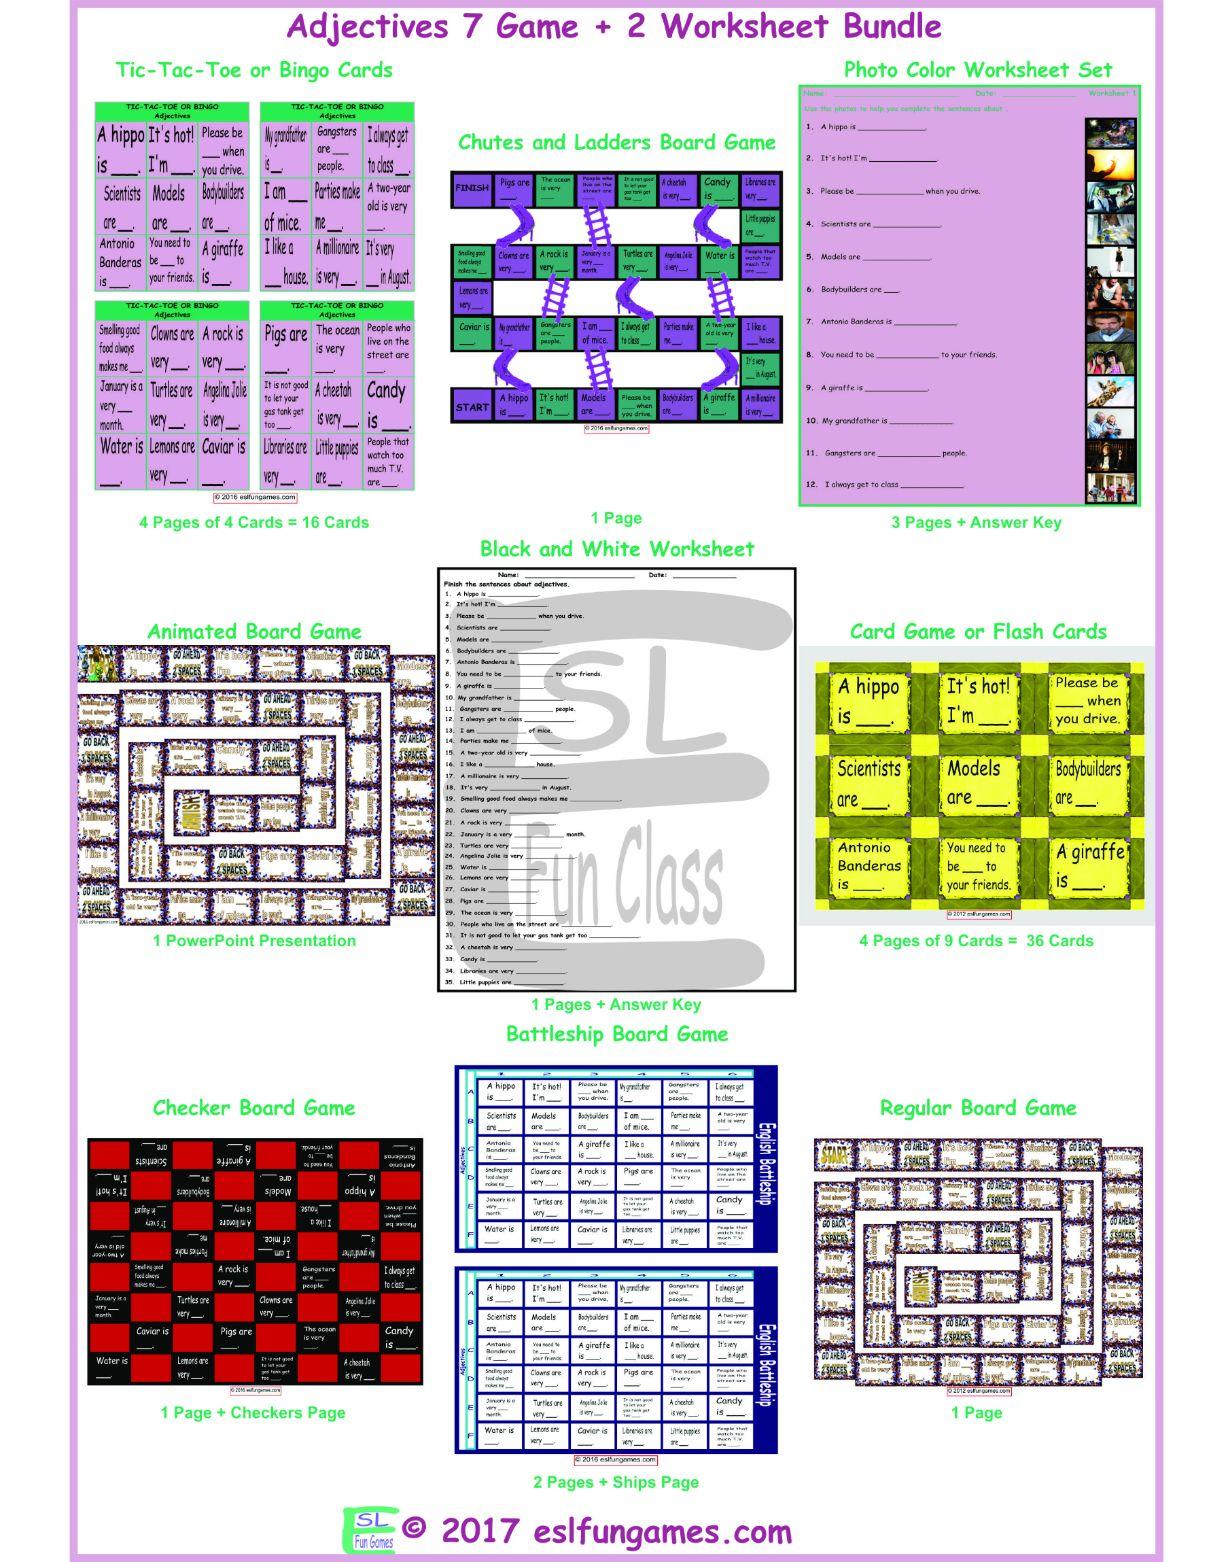 Adjectives 7 Game Plus 2 Worksheet Bundle By Eslfungames